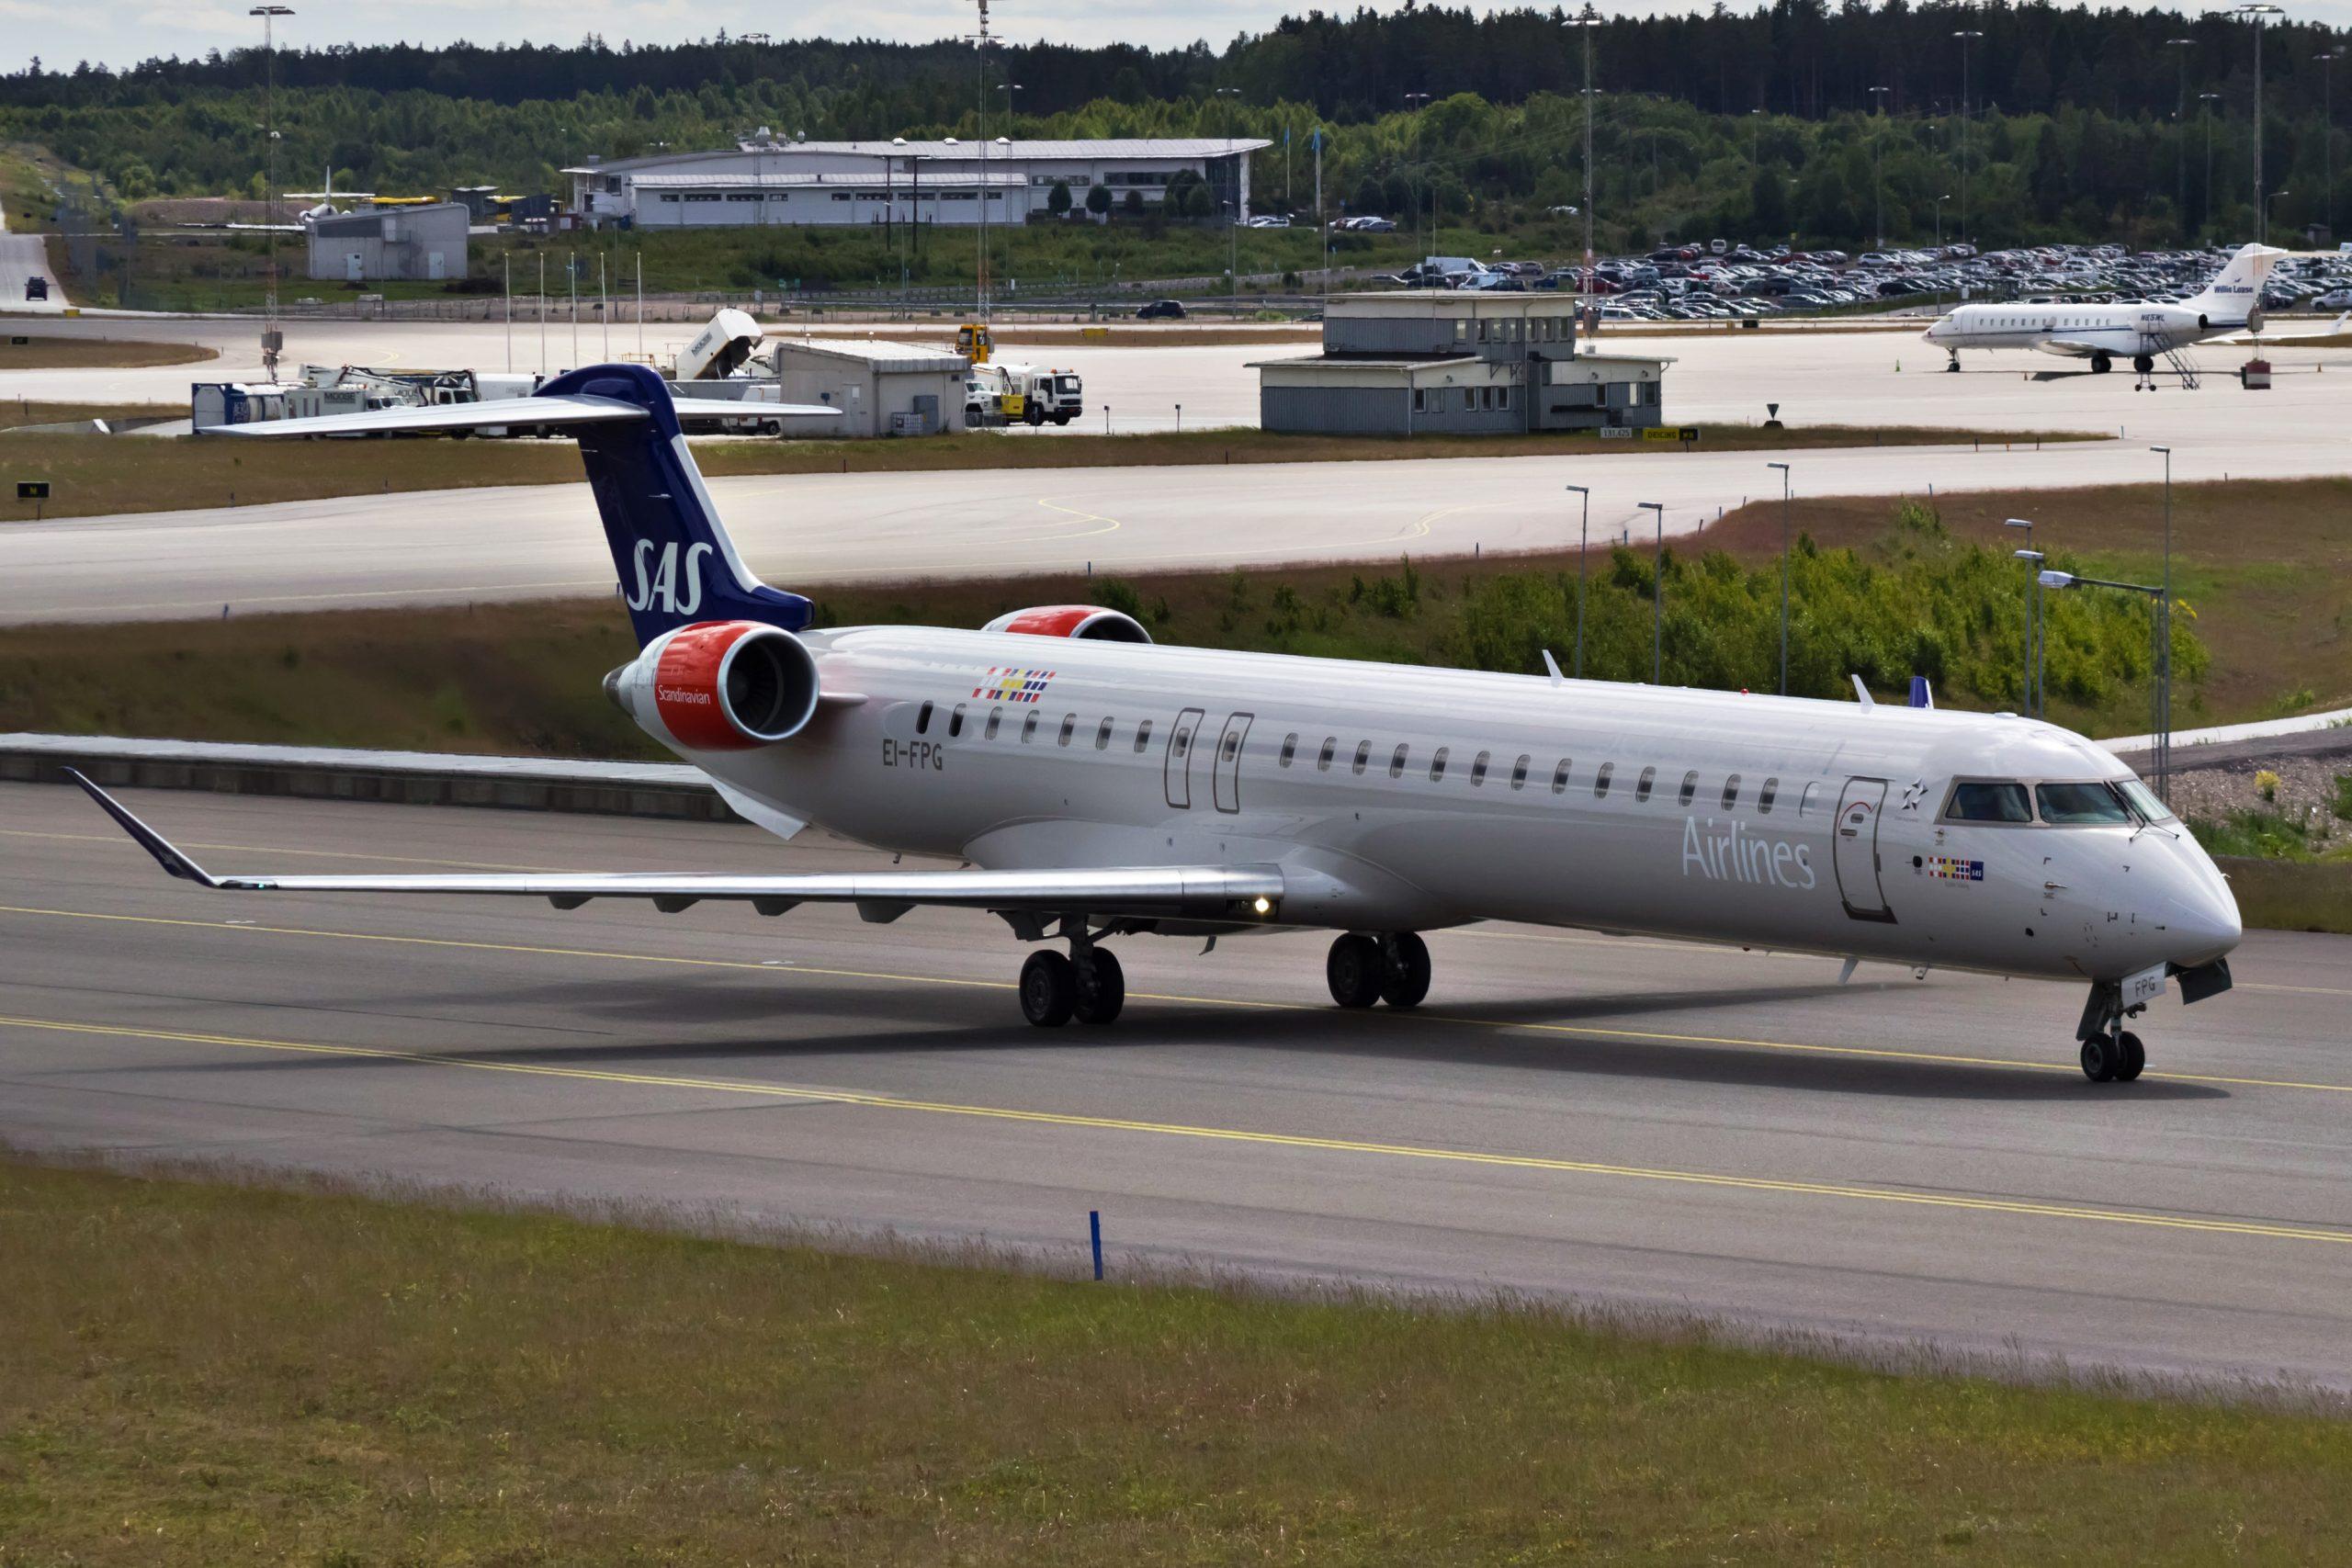 Bombardier CRJ900 fra CityJet i SAS-farver. (Foto: Bene Riobó | CC 4.0)